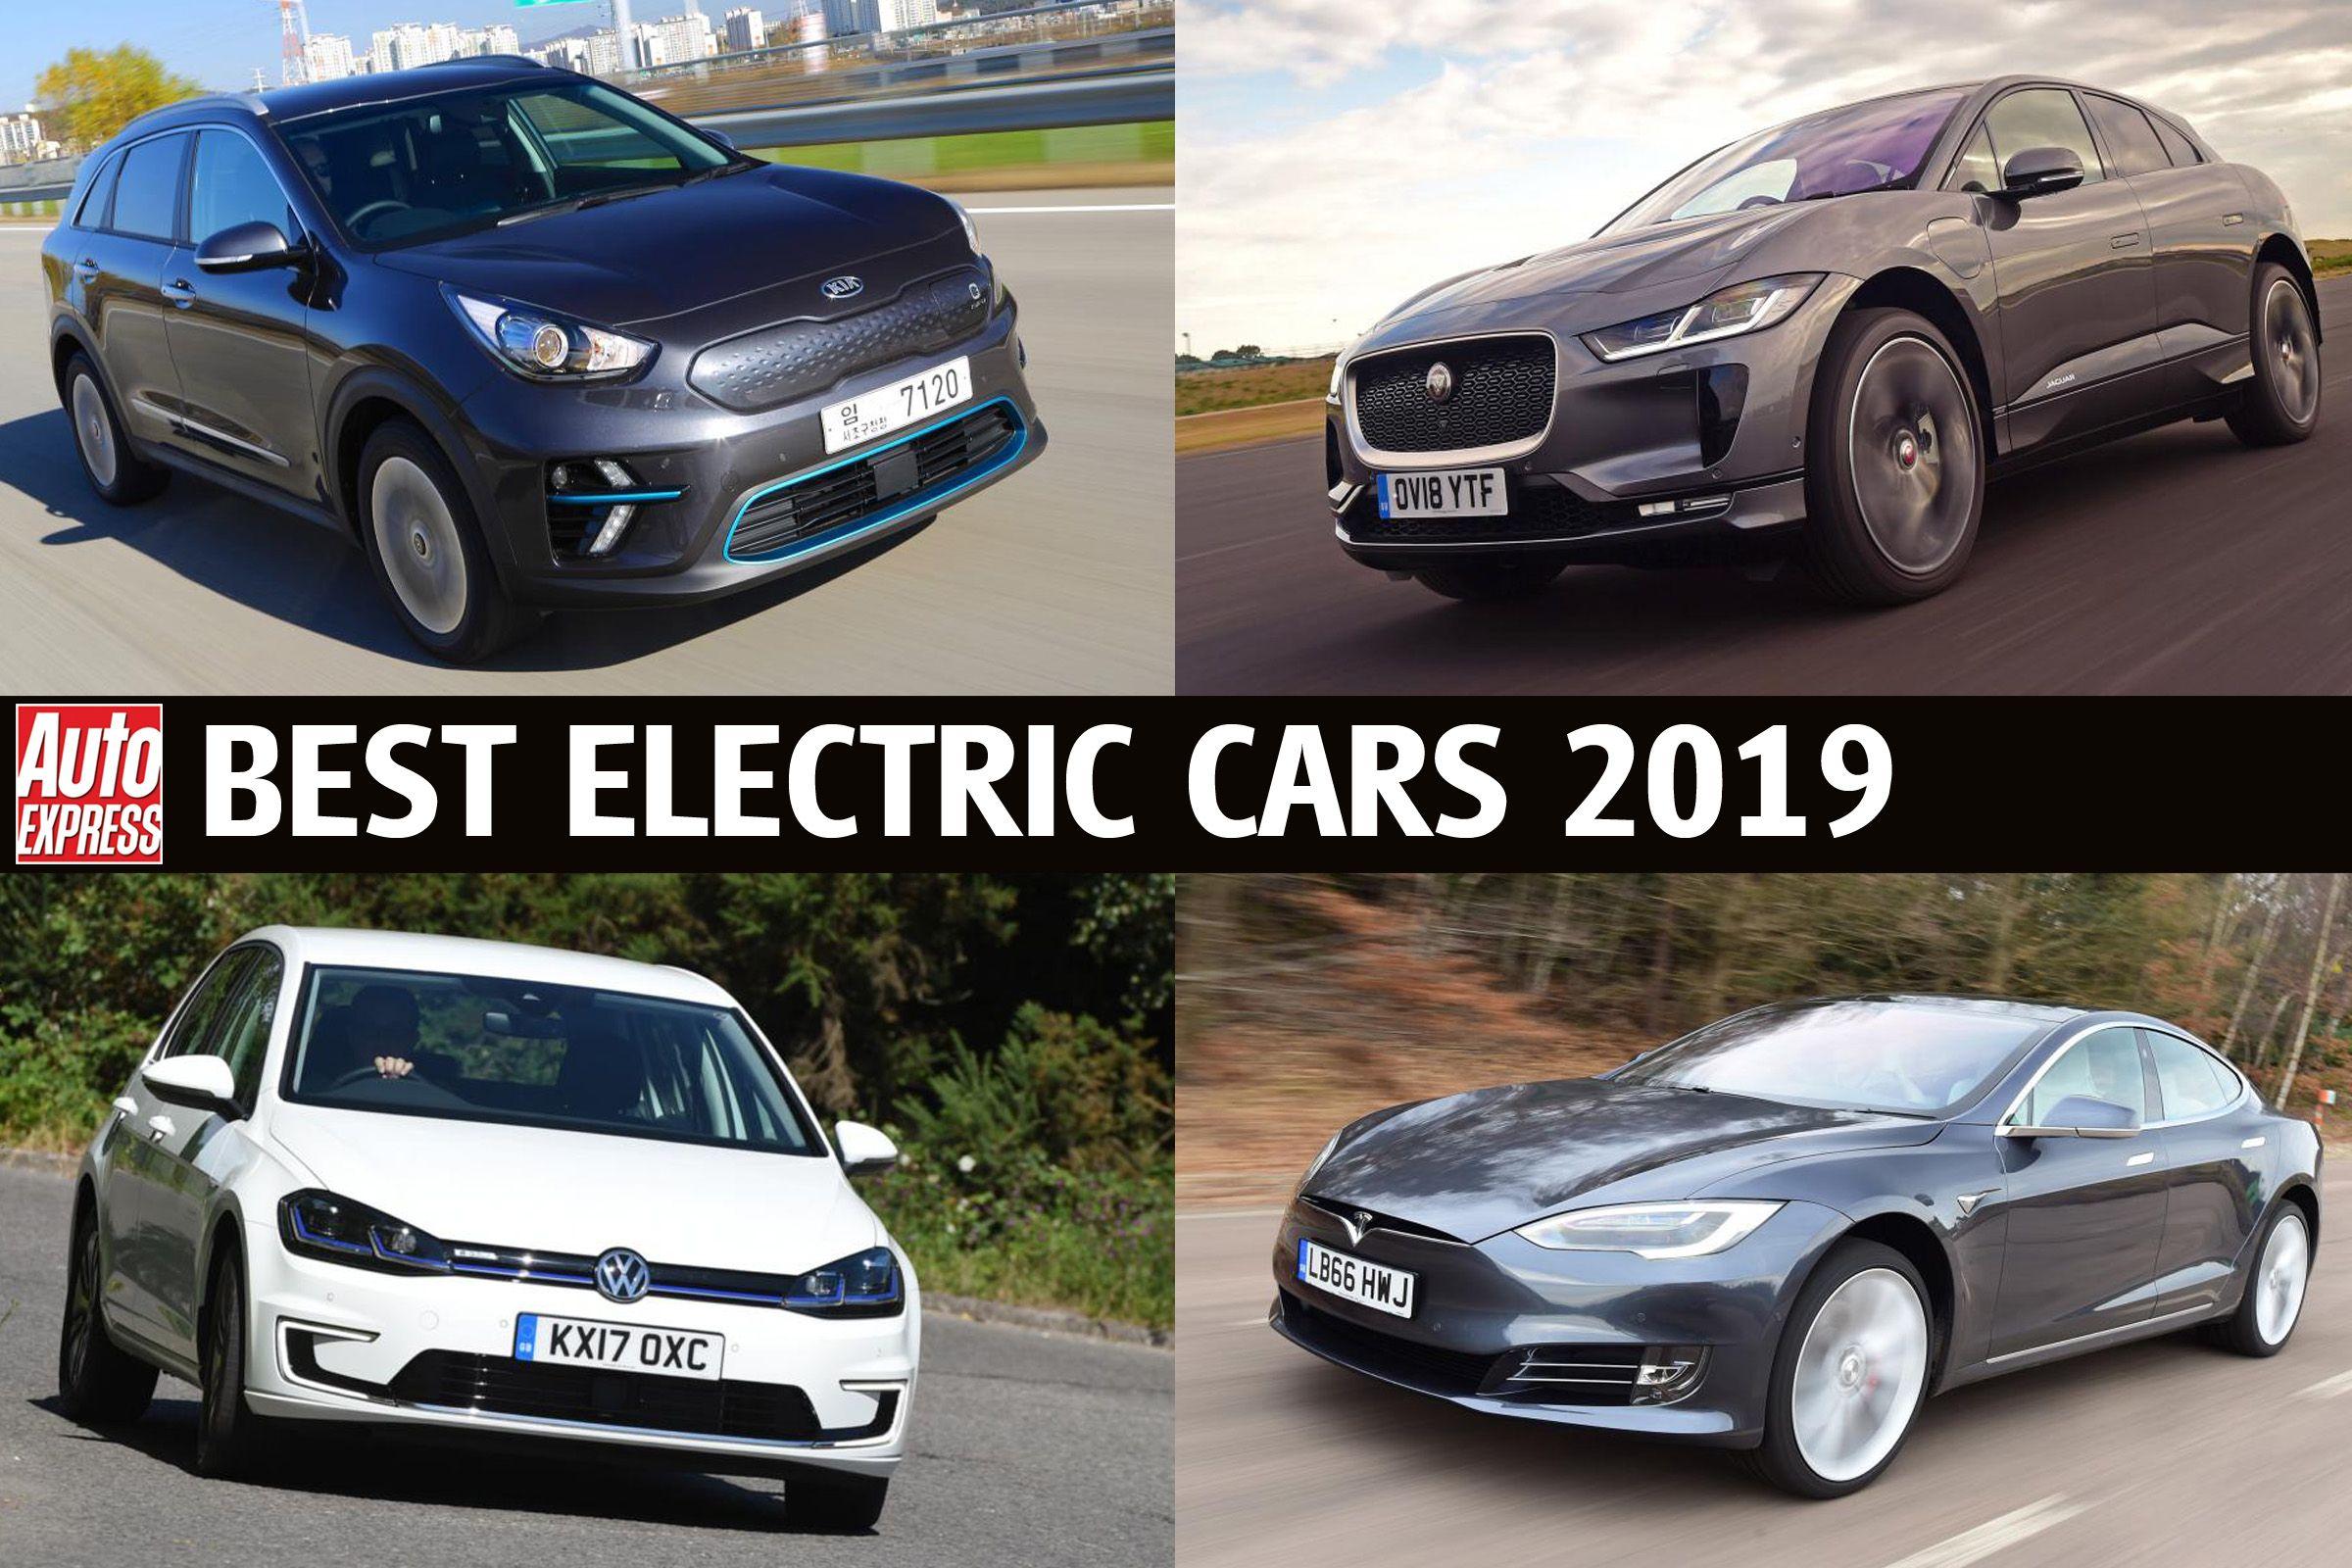 Best Electric Cars 2019 Best Electric Car Electric Cars Electric Cars Uk